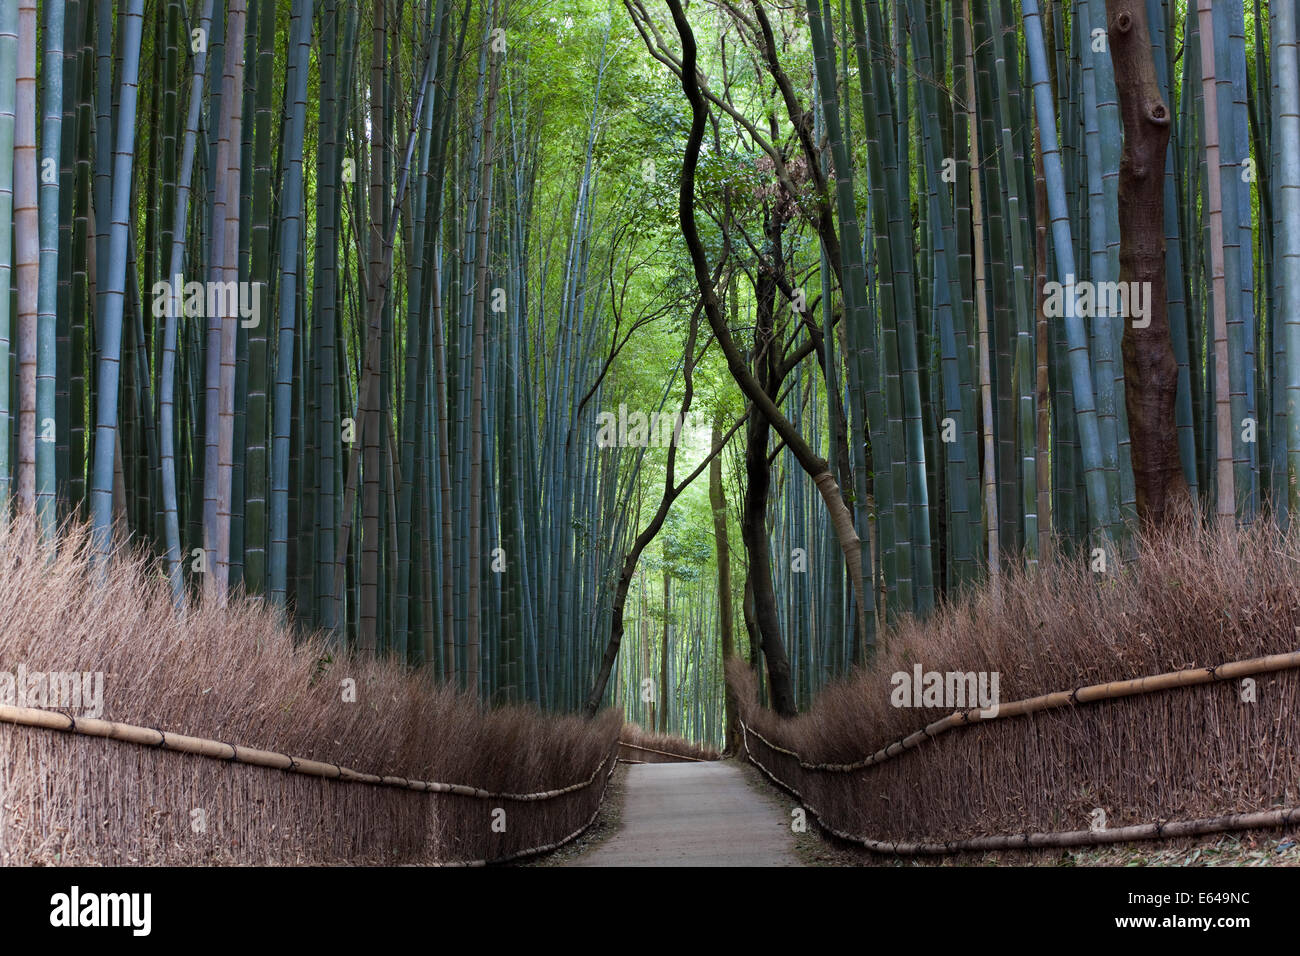 Pfad durch Bambuswald, Kyoto, Japan Stockbild